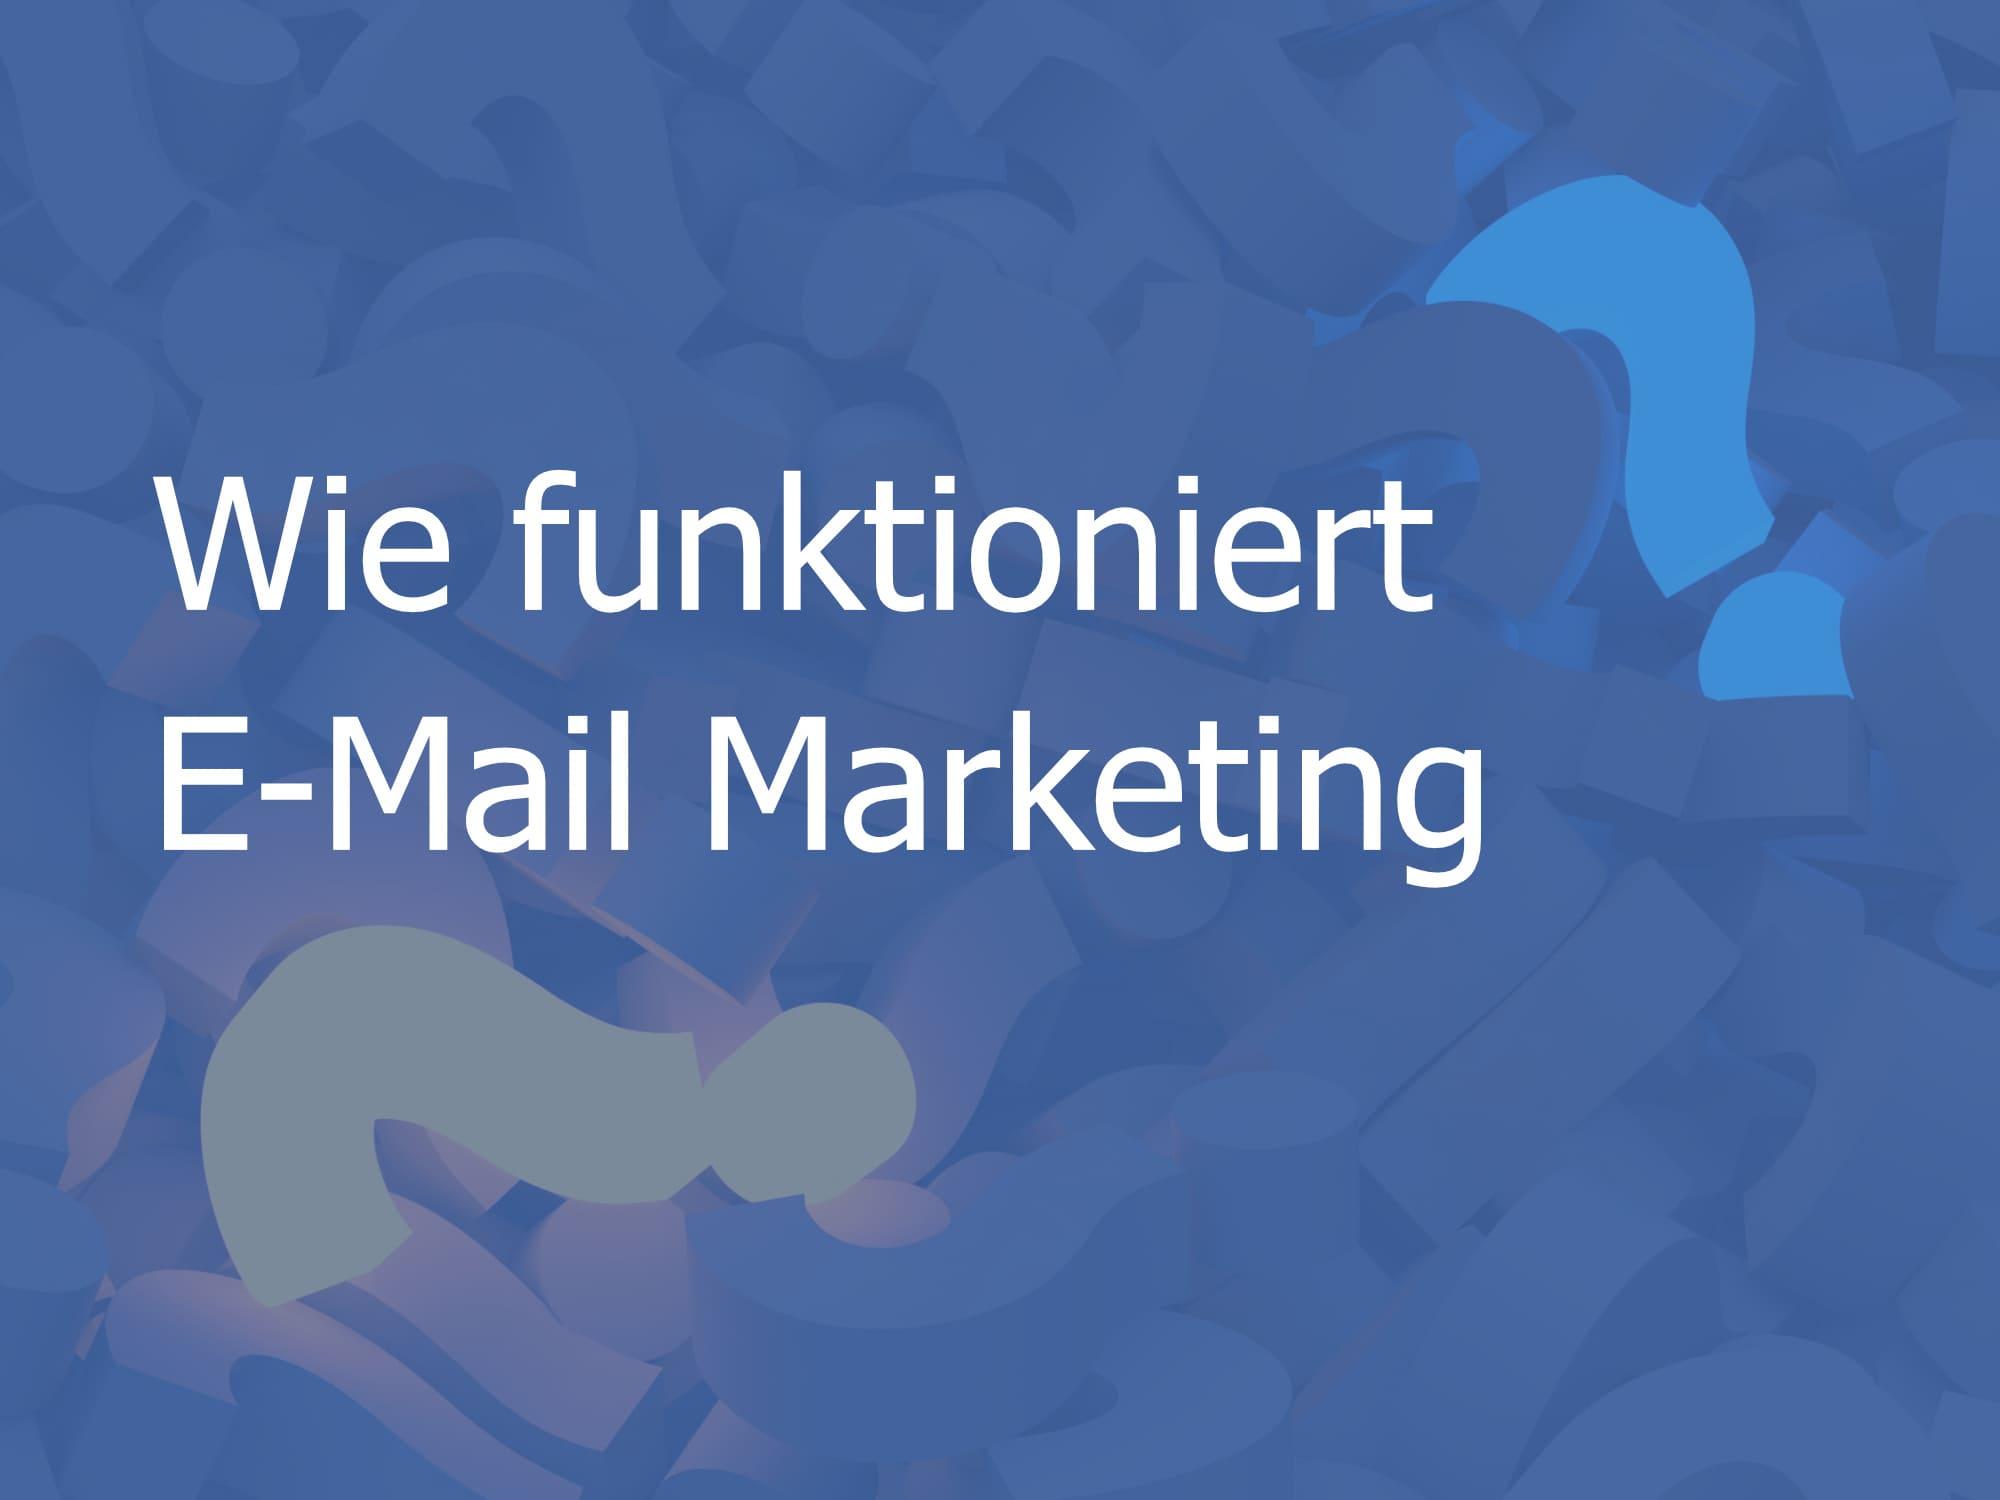 Wie funktioniert E-Mail Marketing